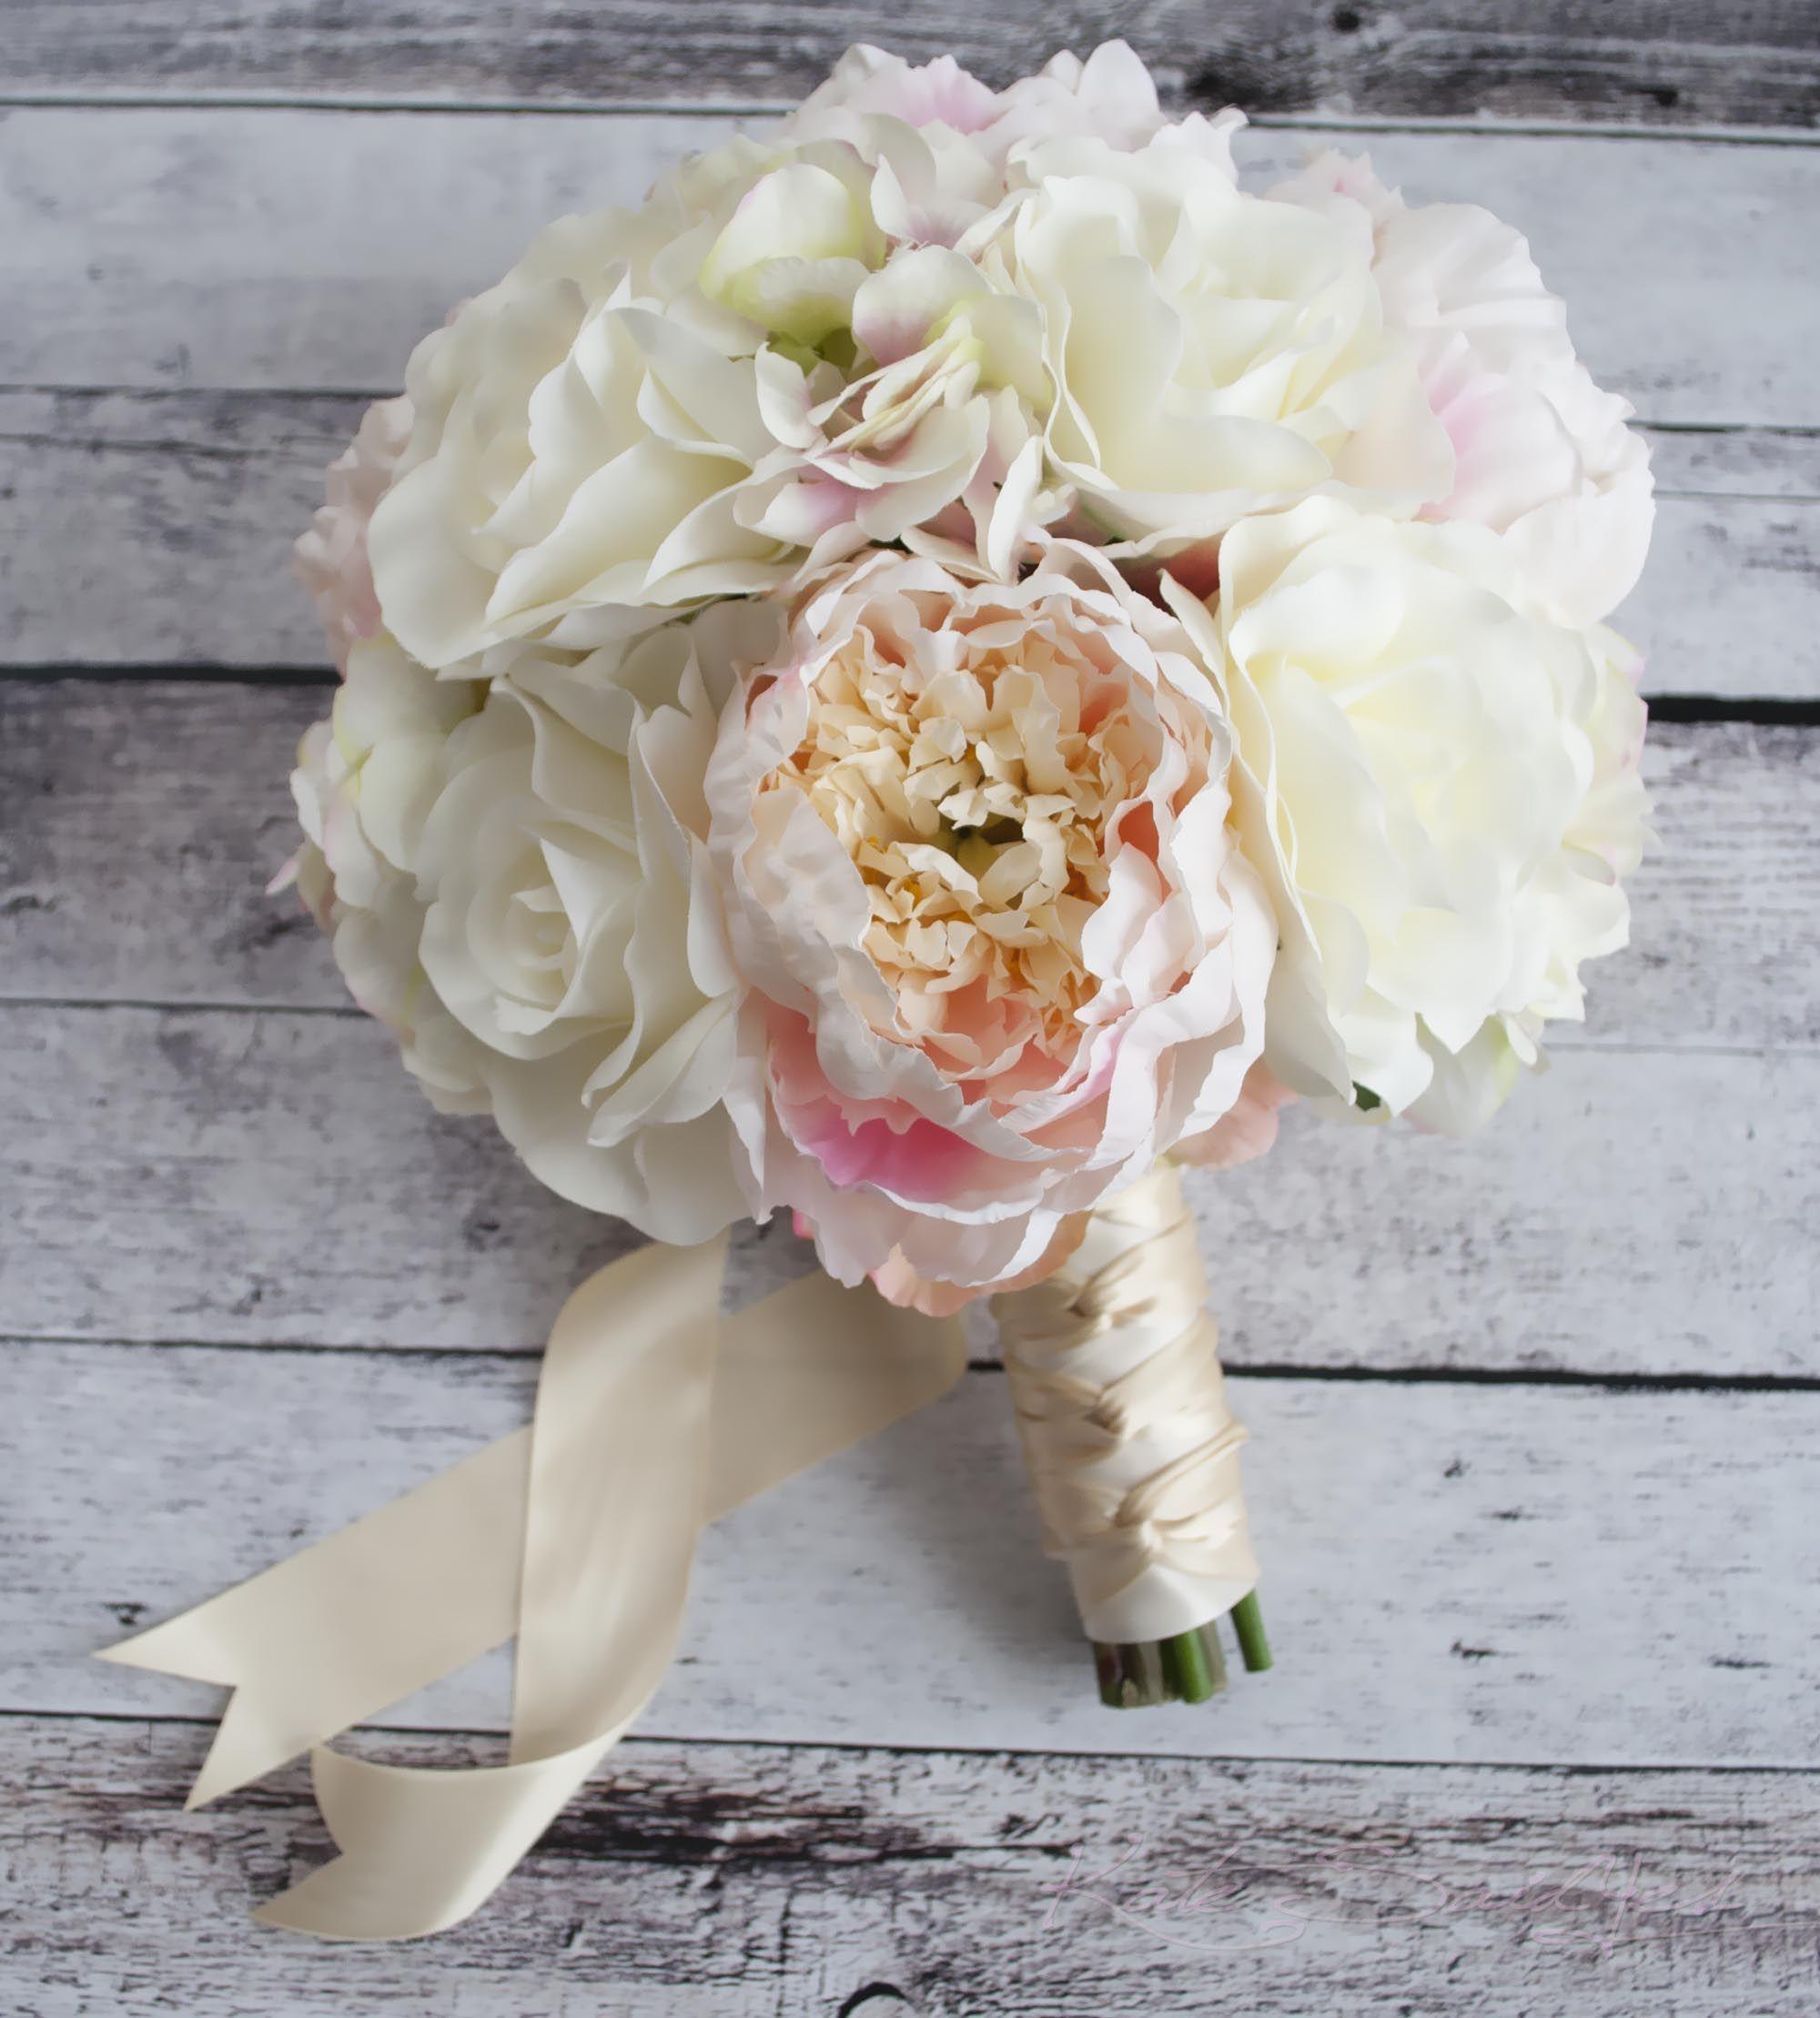 Soft Romantic Elegant Wedding Ideas: A Romantic Peony, Rose And Hydrangea